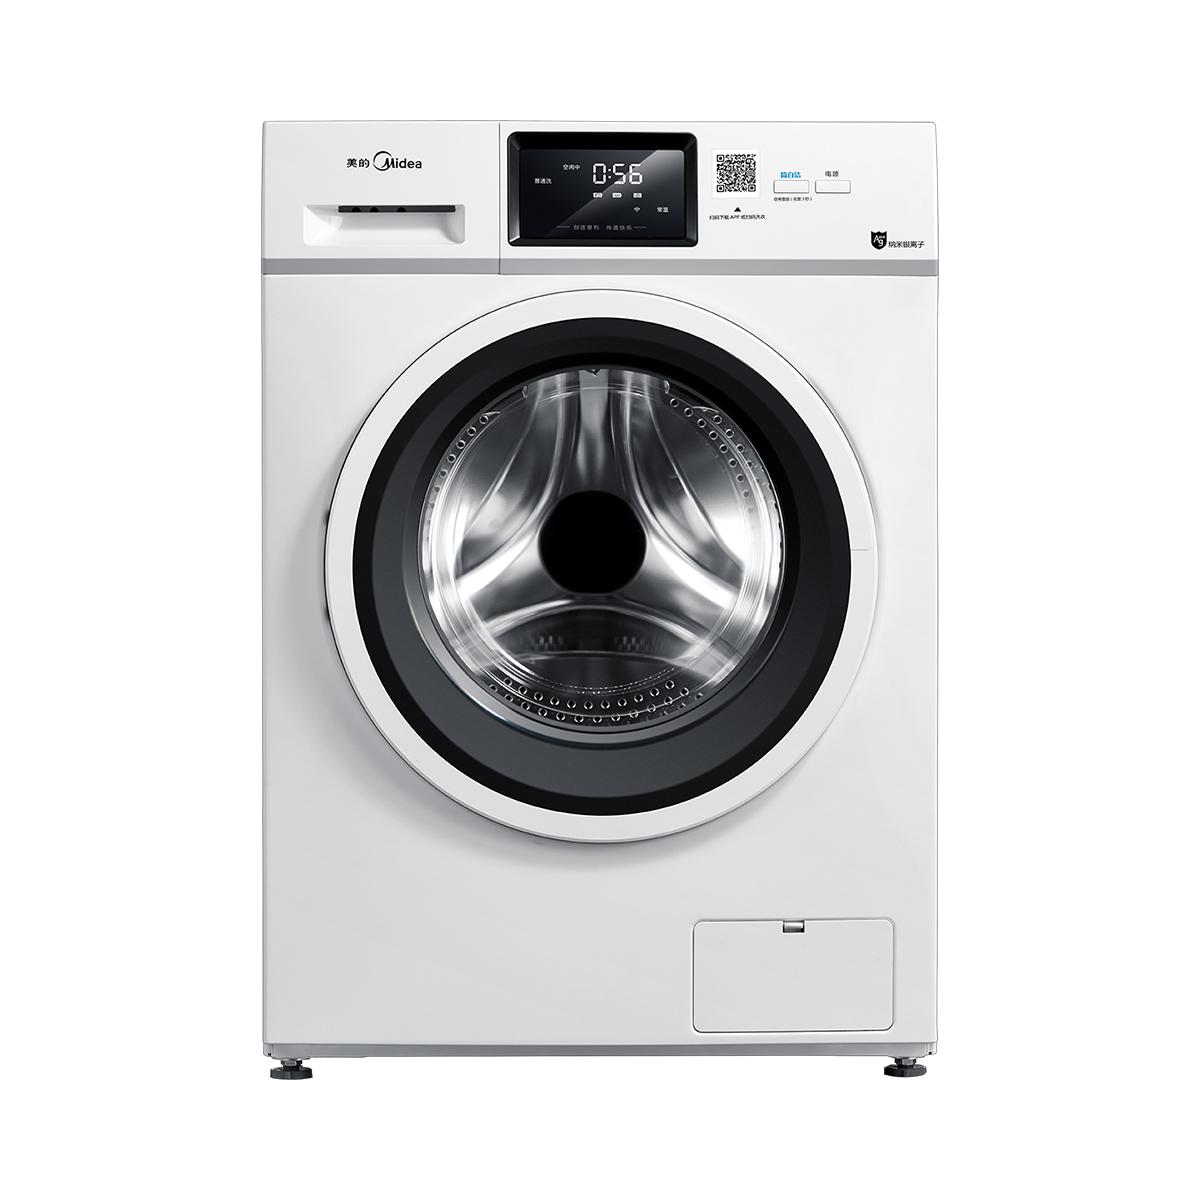 Midea/美的 MG80-GF05DW洗衣机 说明书.pdf